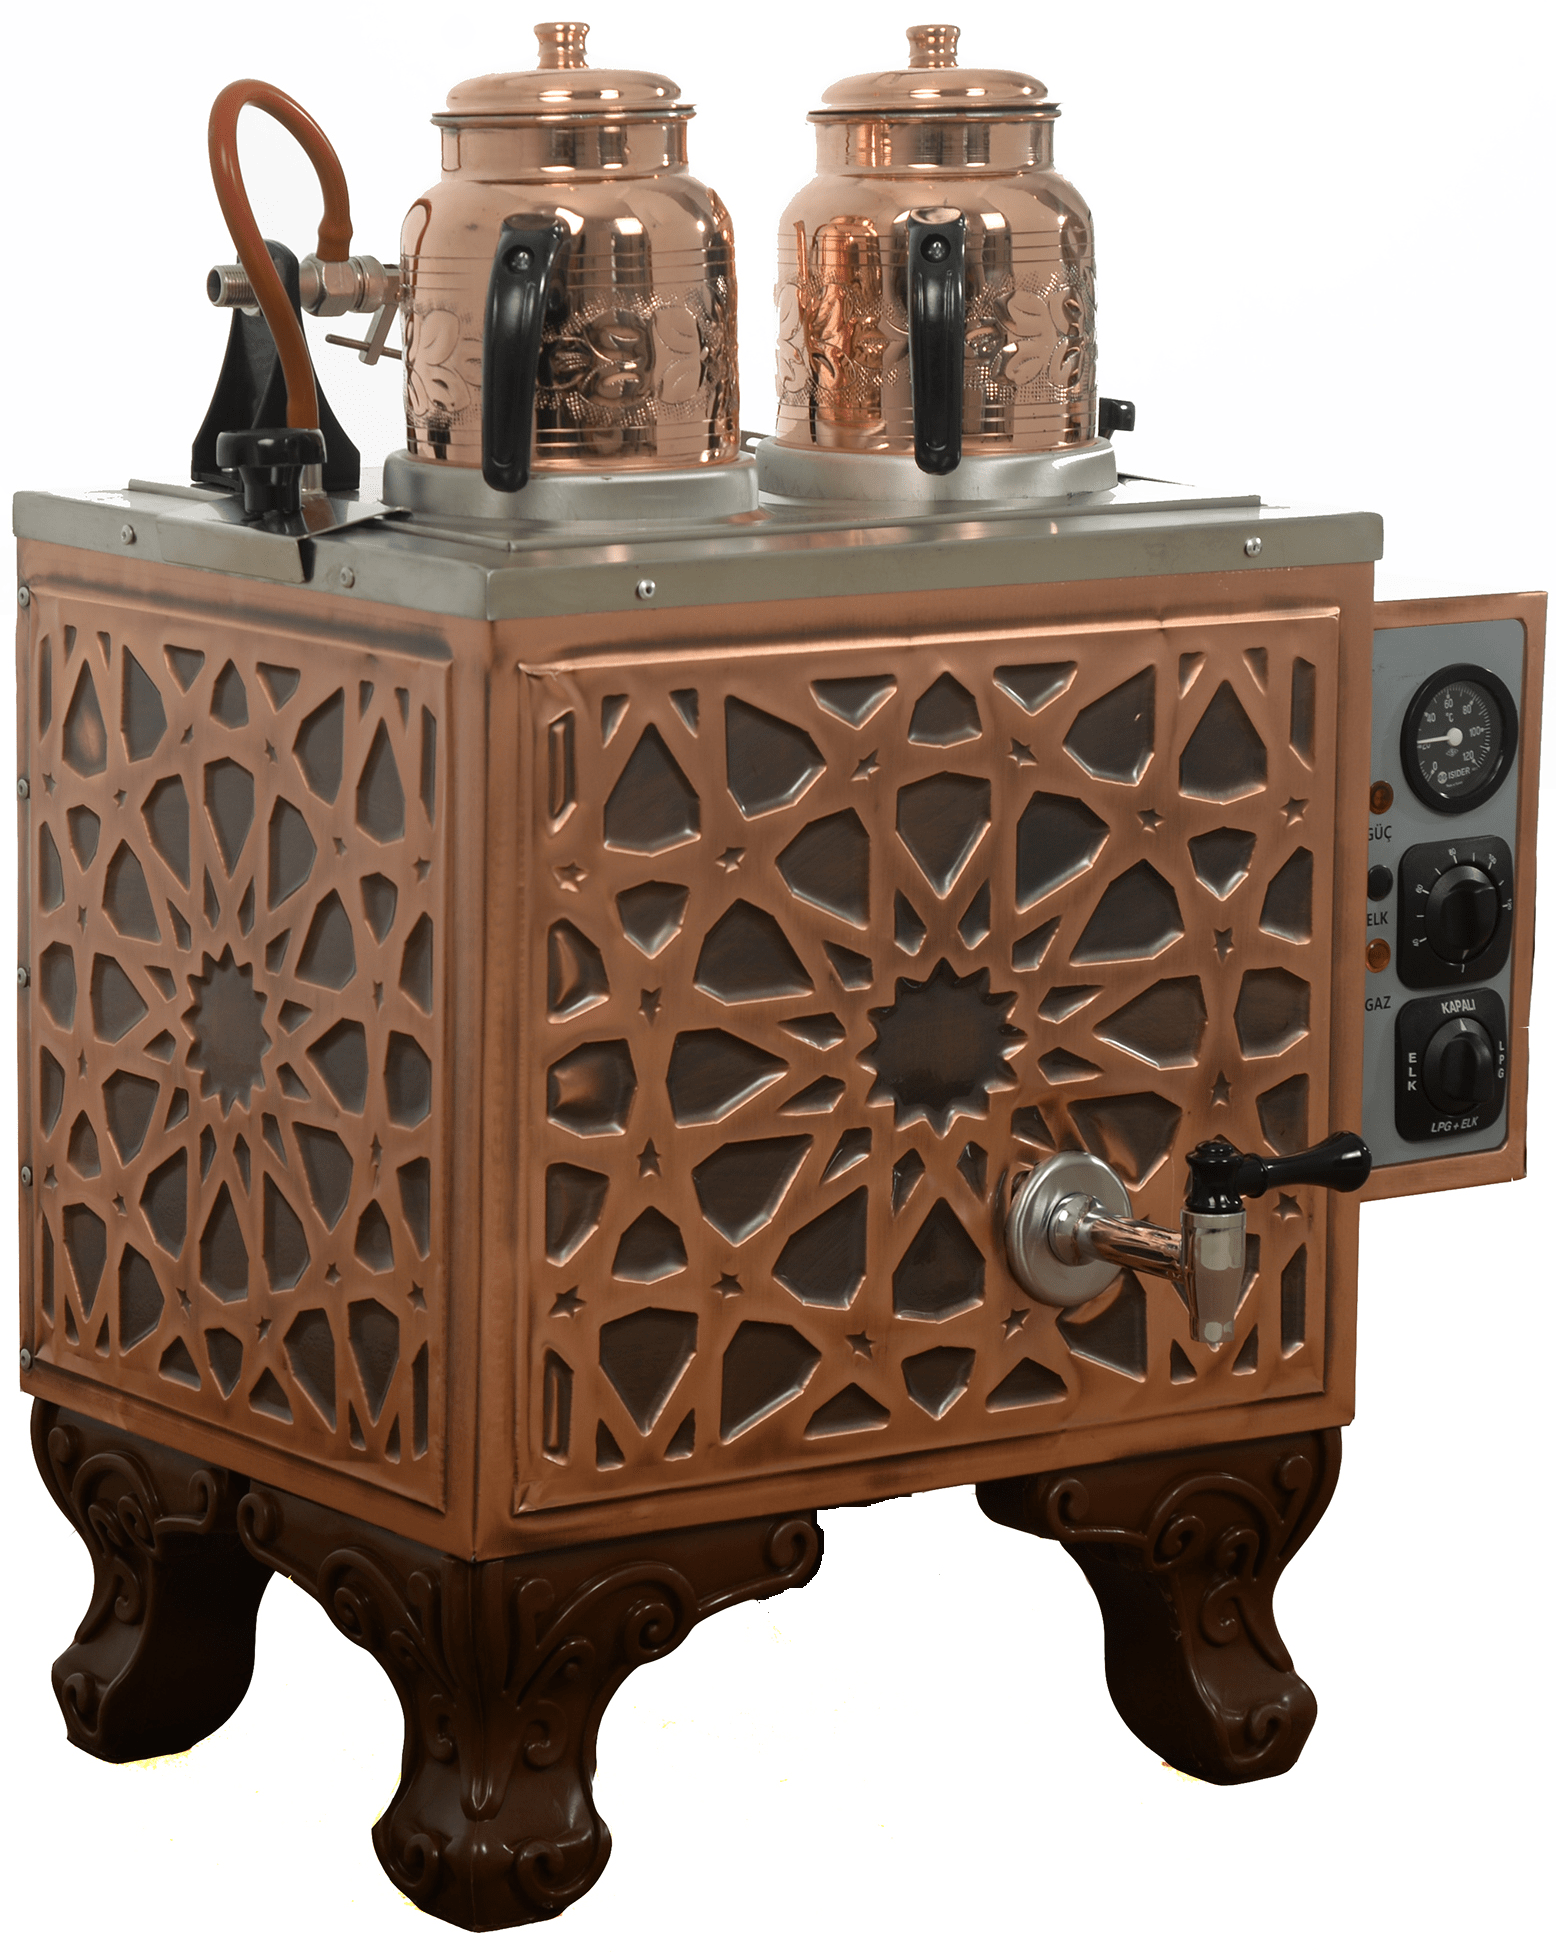 Professionel Tea Machine, Tea Maker, Turkish Tea Maker, Turkish Tea Maker Machine